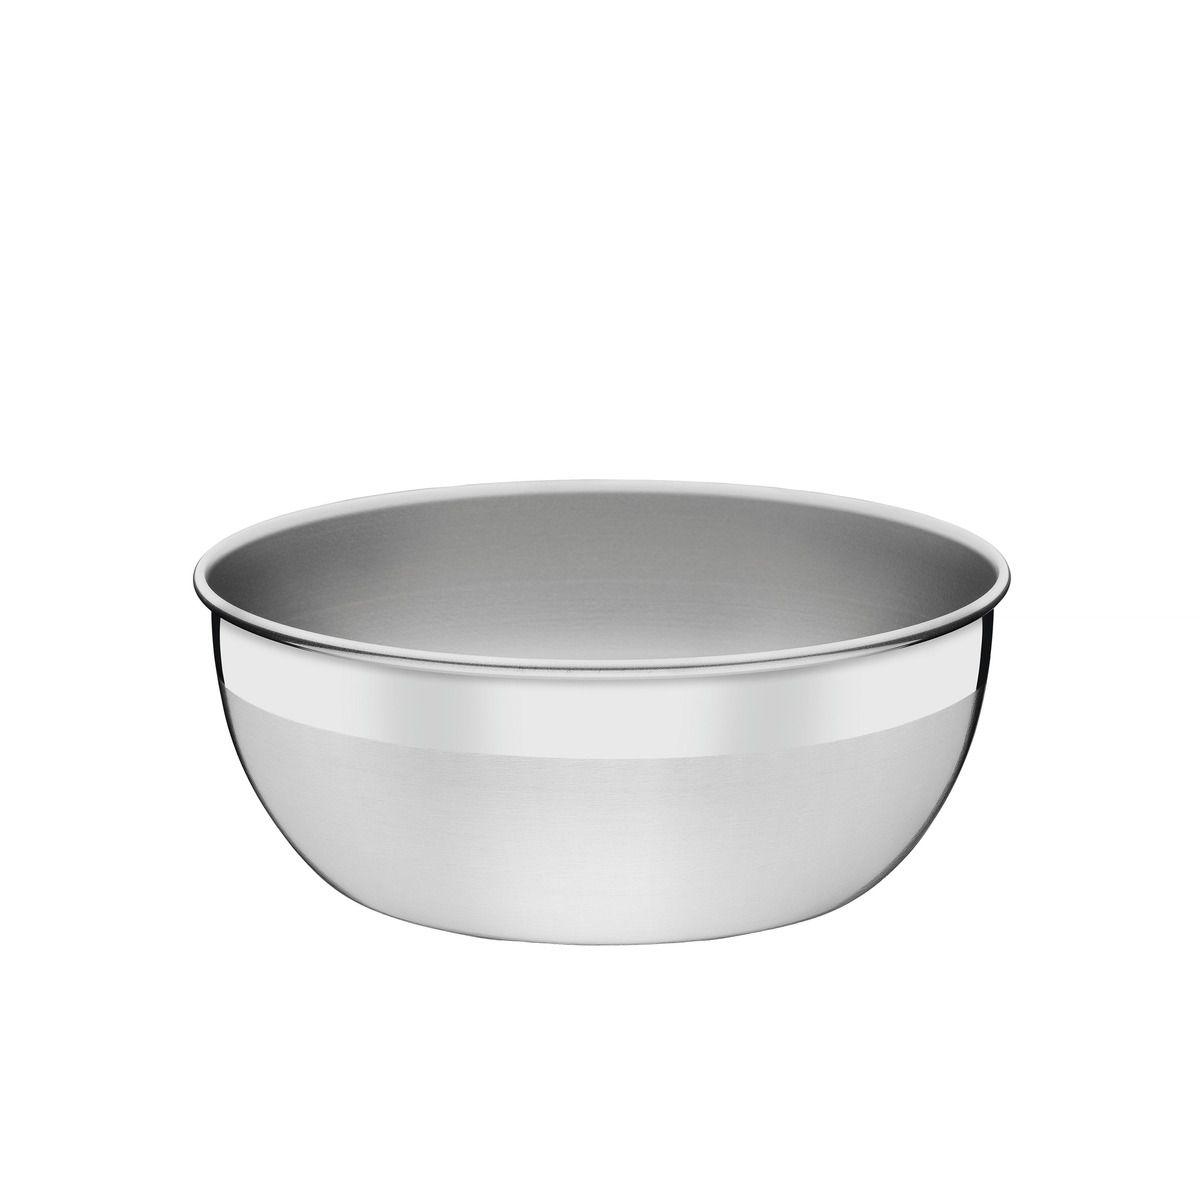 Pote redondo aço inox sem tampa plástica Ø 22cm 61220/221 | Lojas Estrela